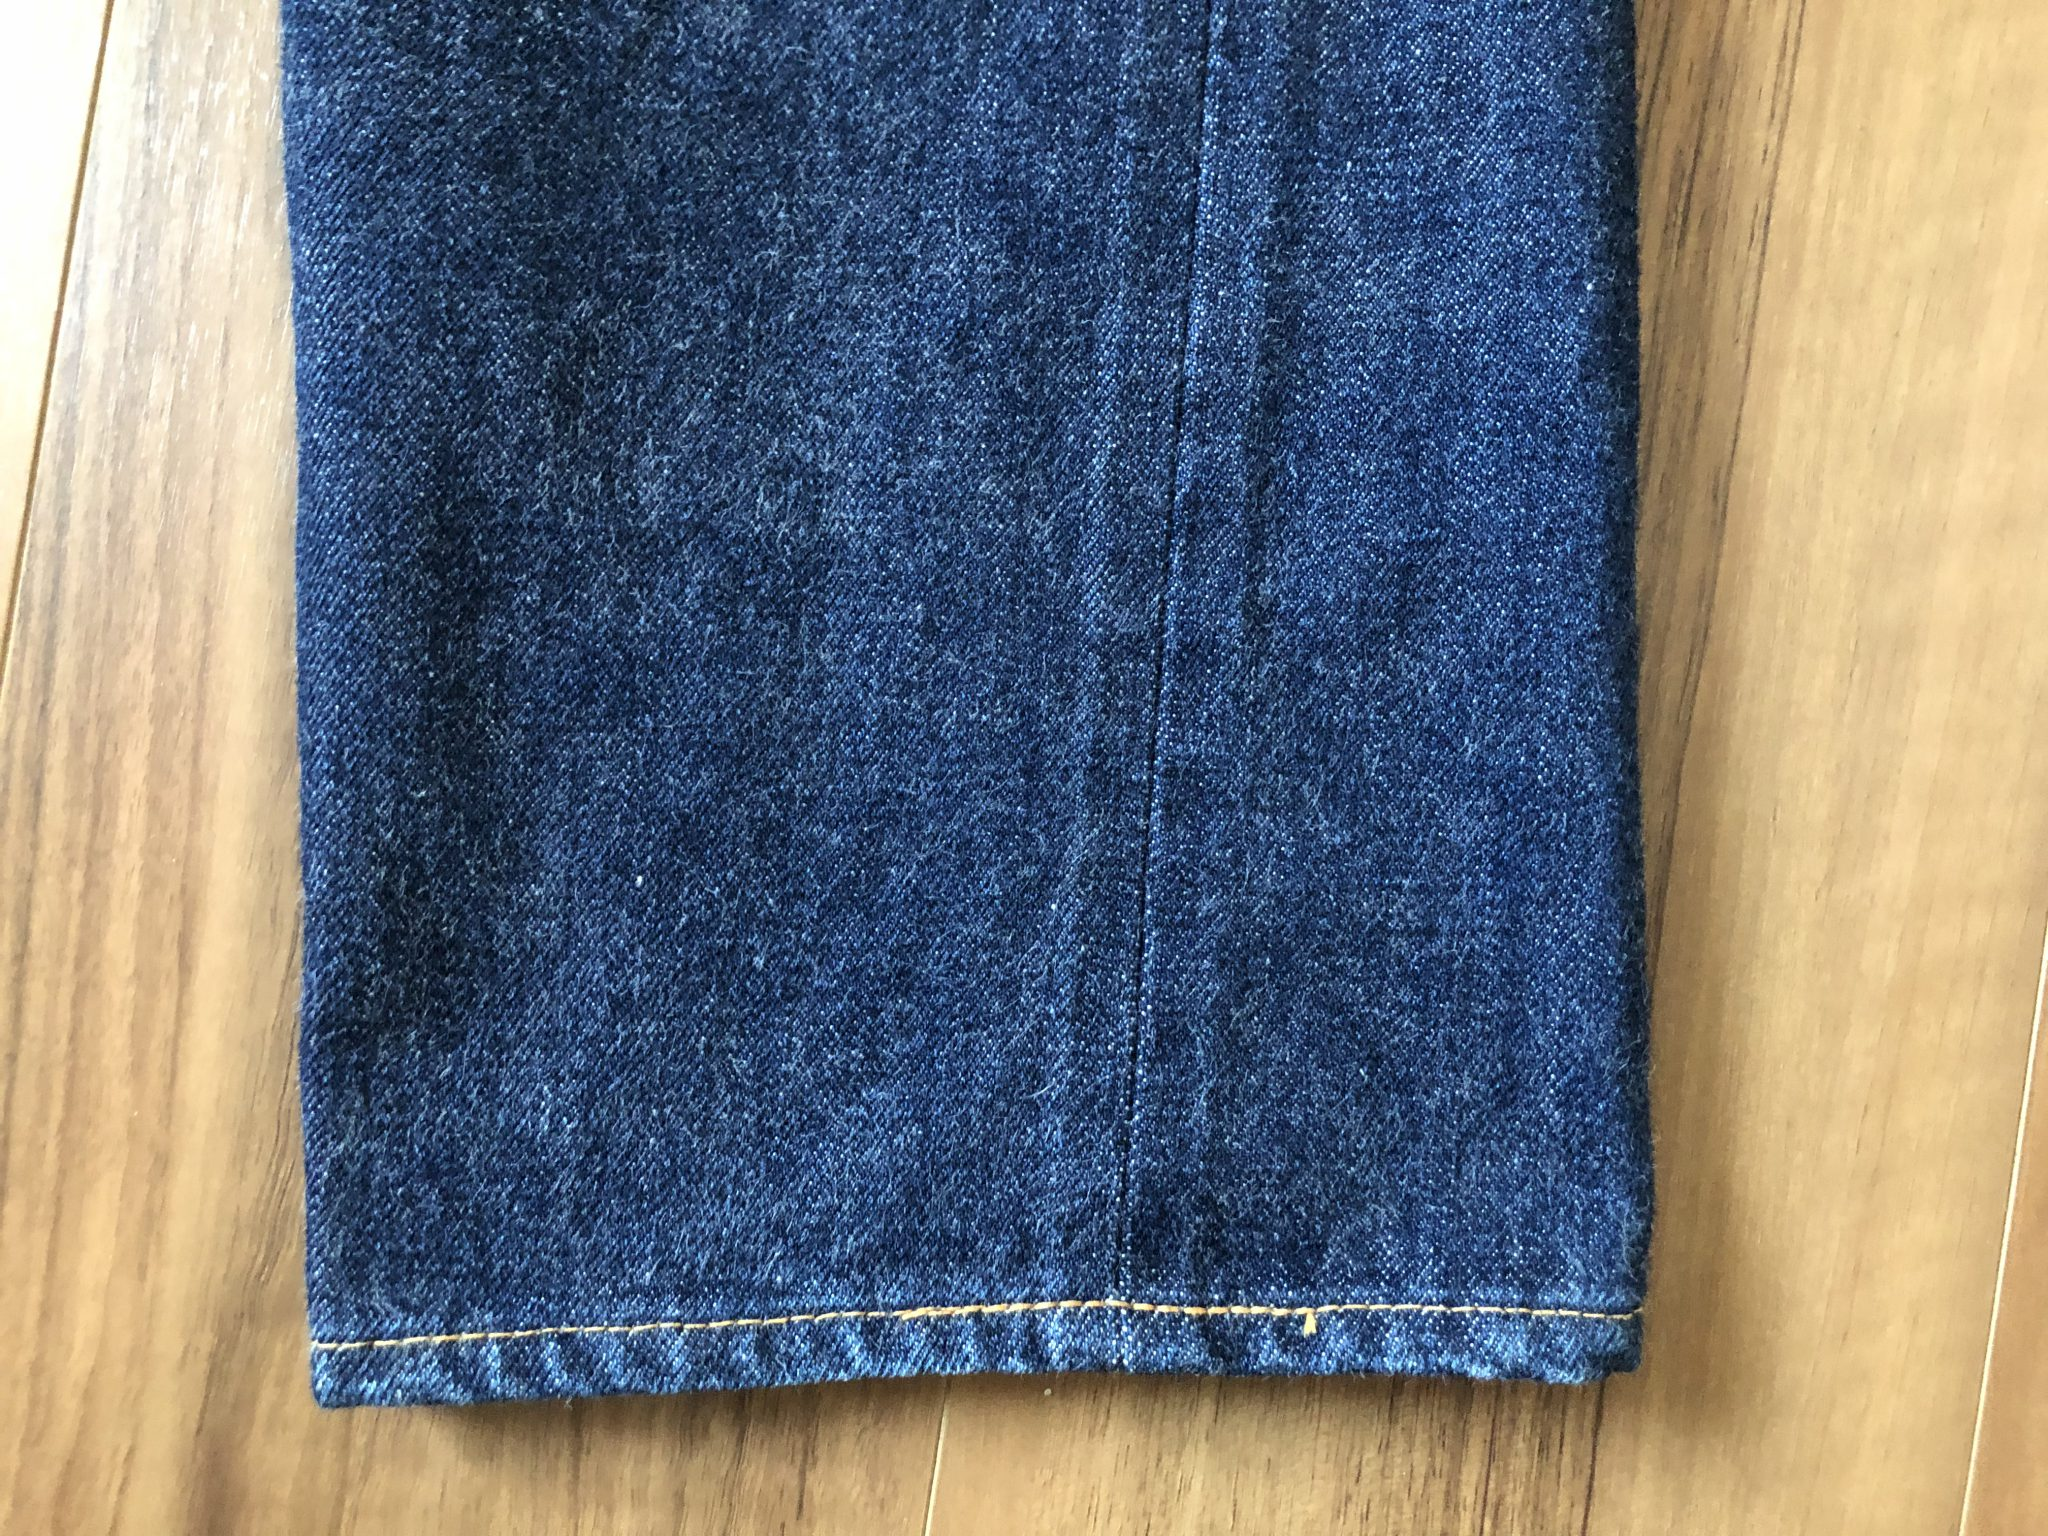 Resolute710 リゾルト710 10回目 洗濯 エイジング 経年変化 裾 スソ ミミ